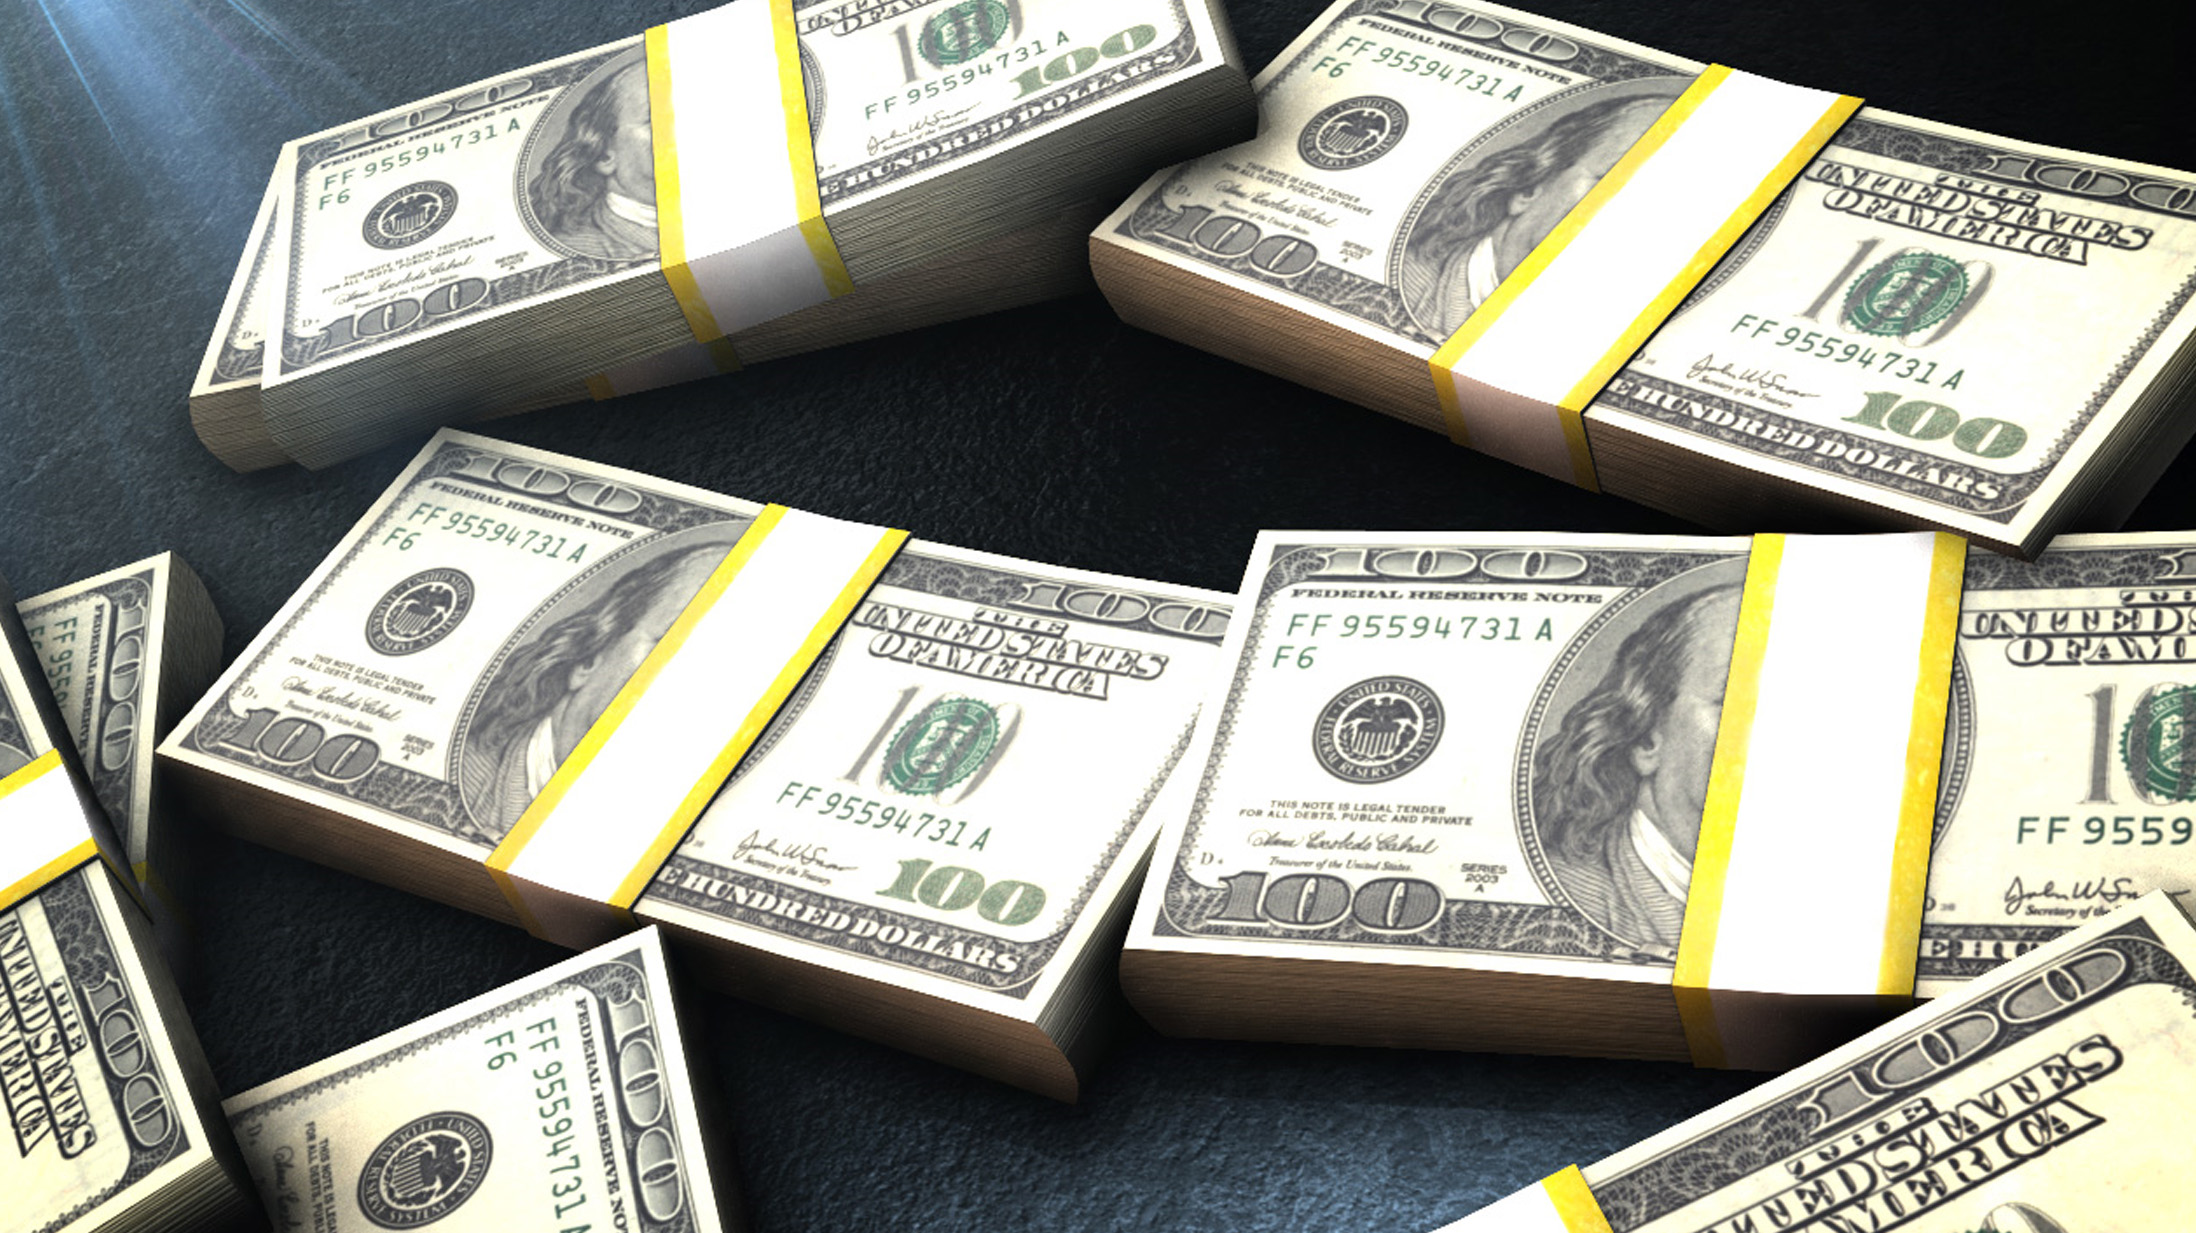 Money 10122015_1454461465269.jpg